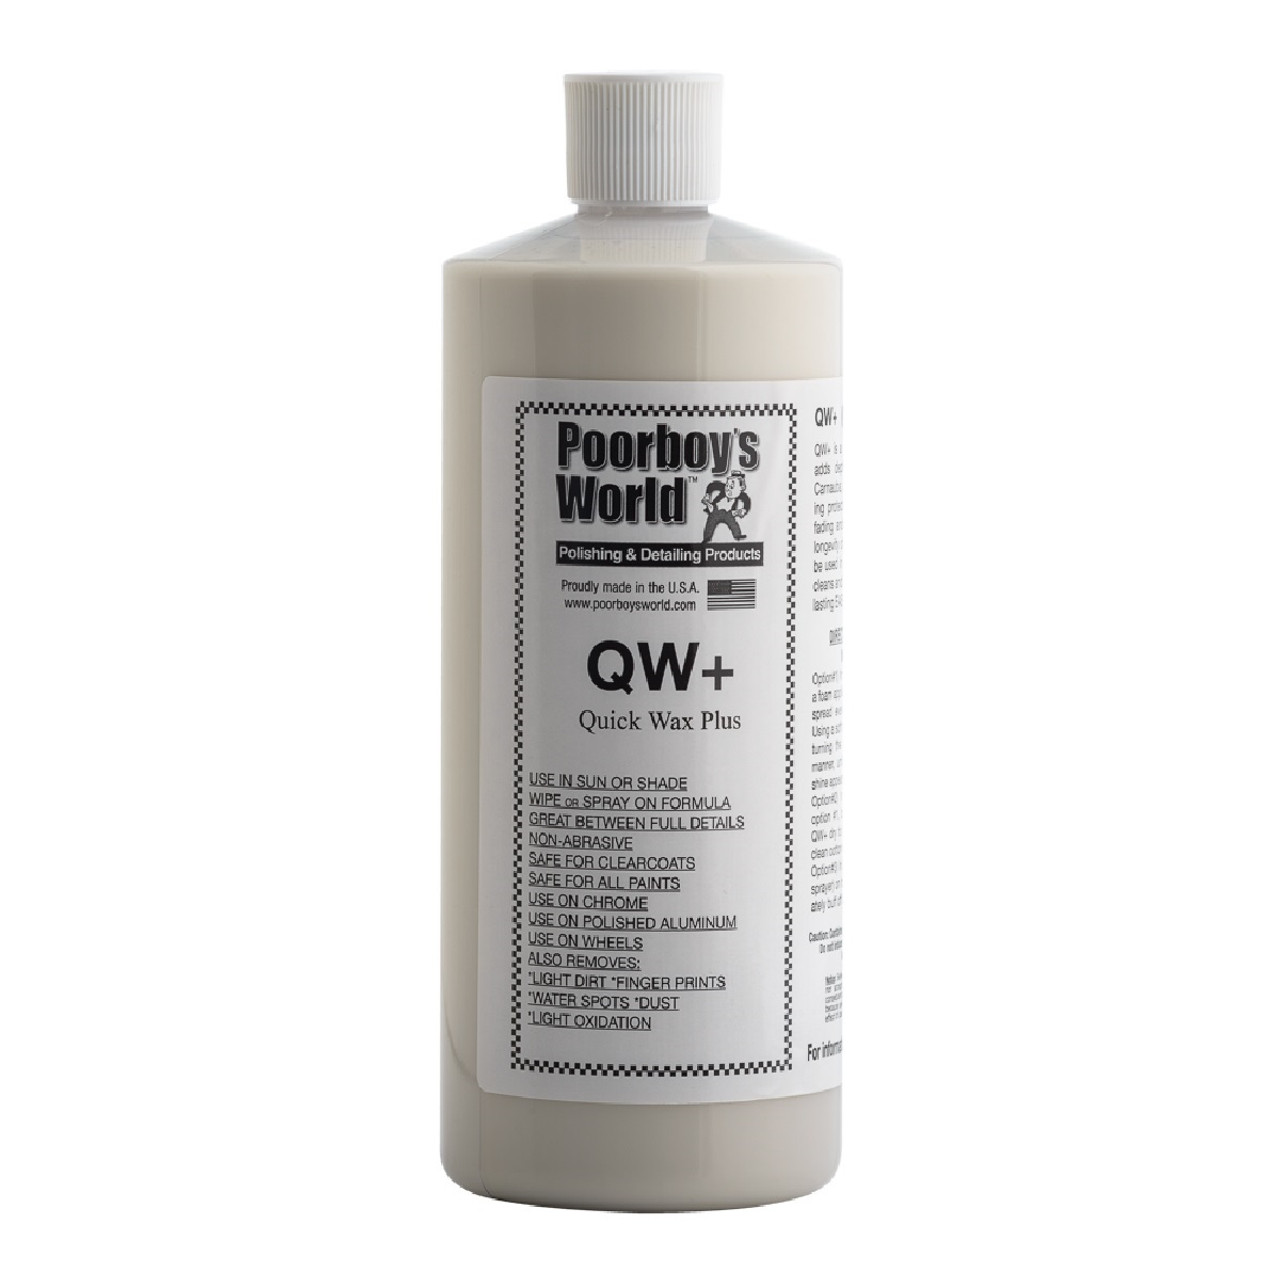 Poorboy's World QW+ Quick Wax 32oz